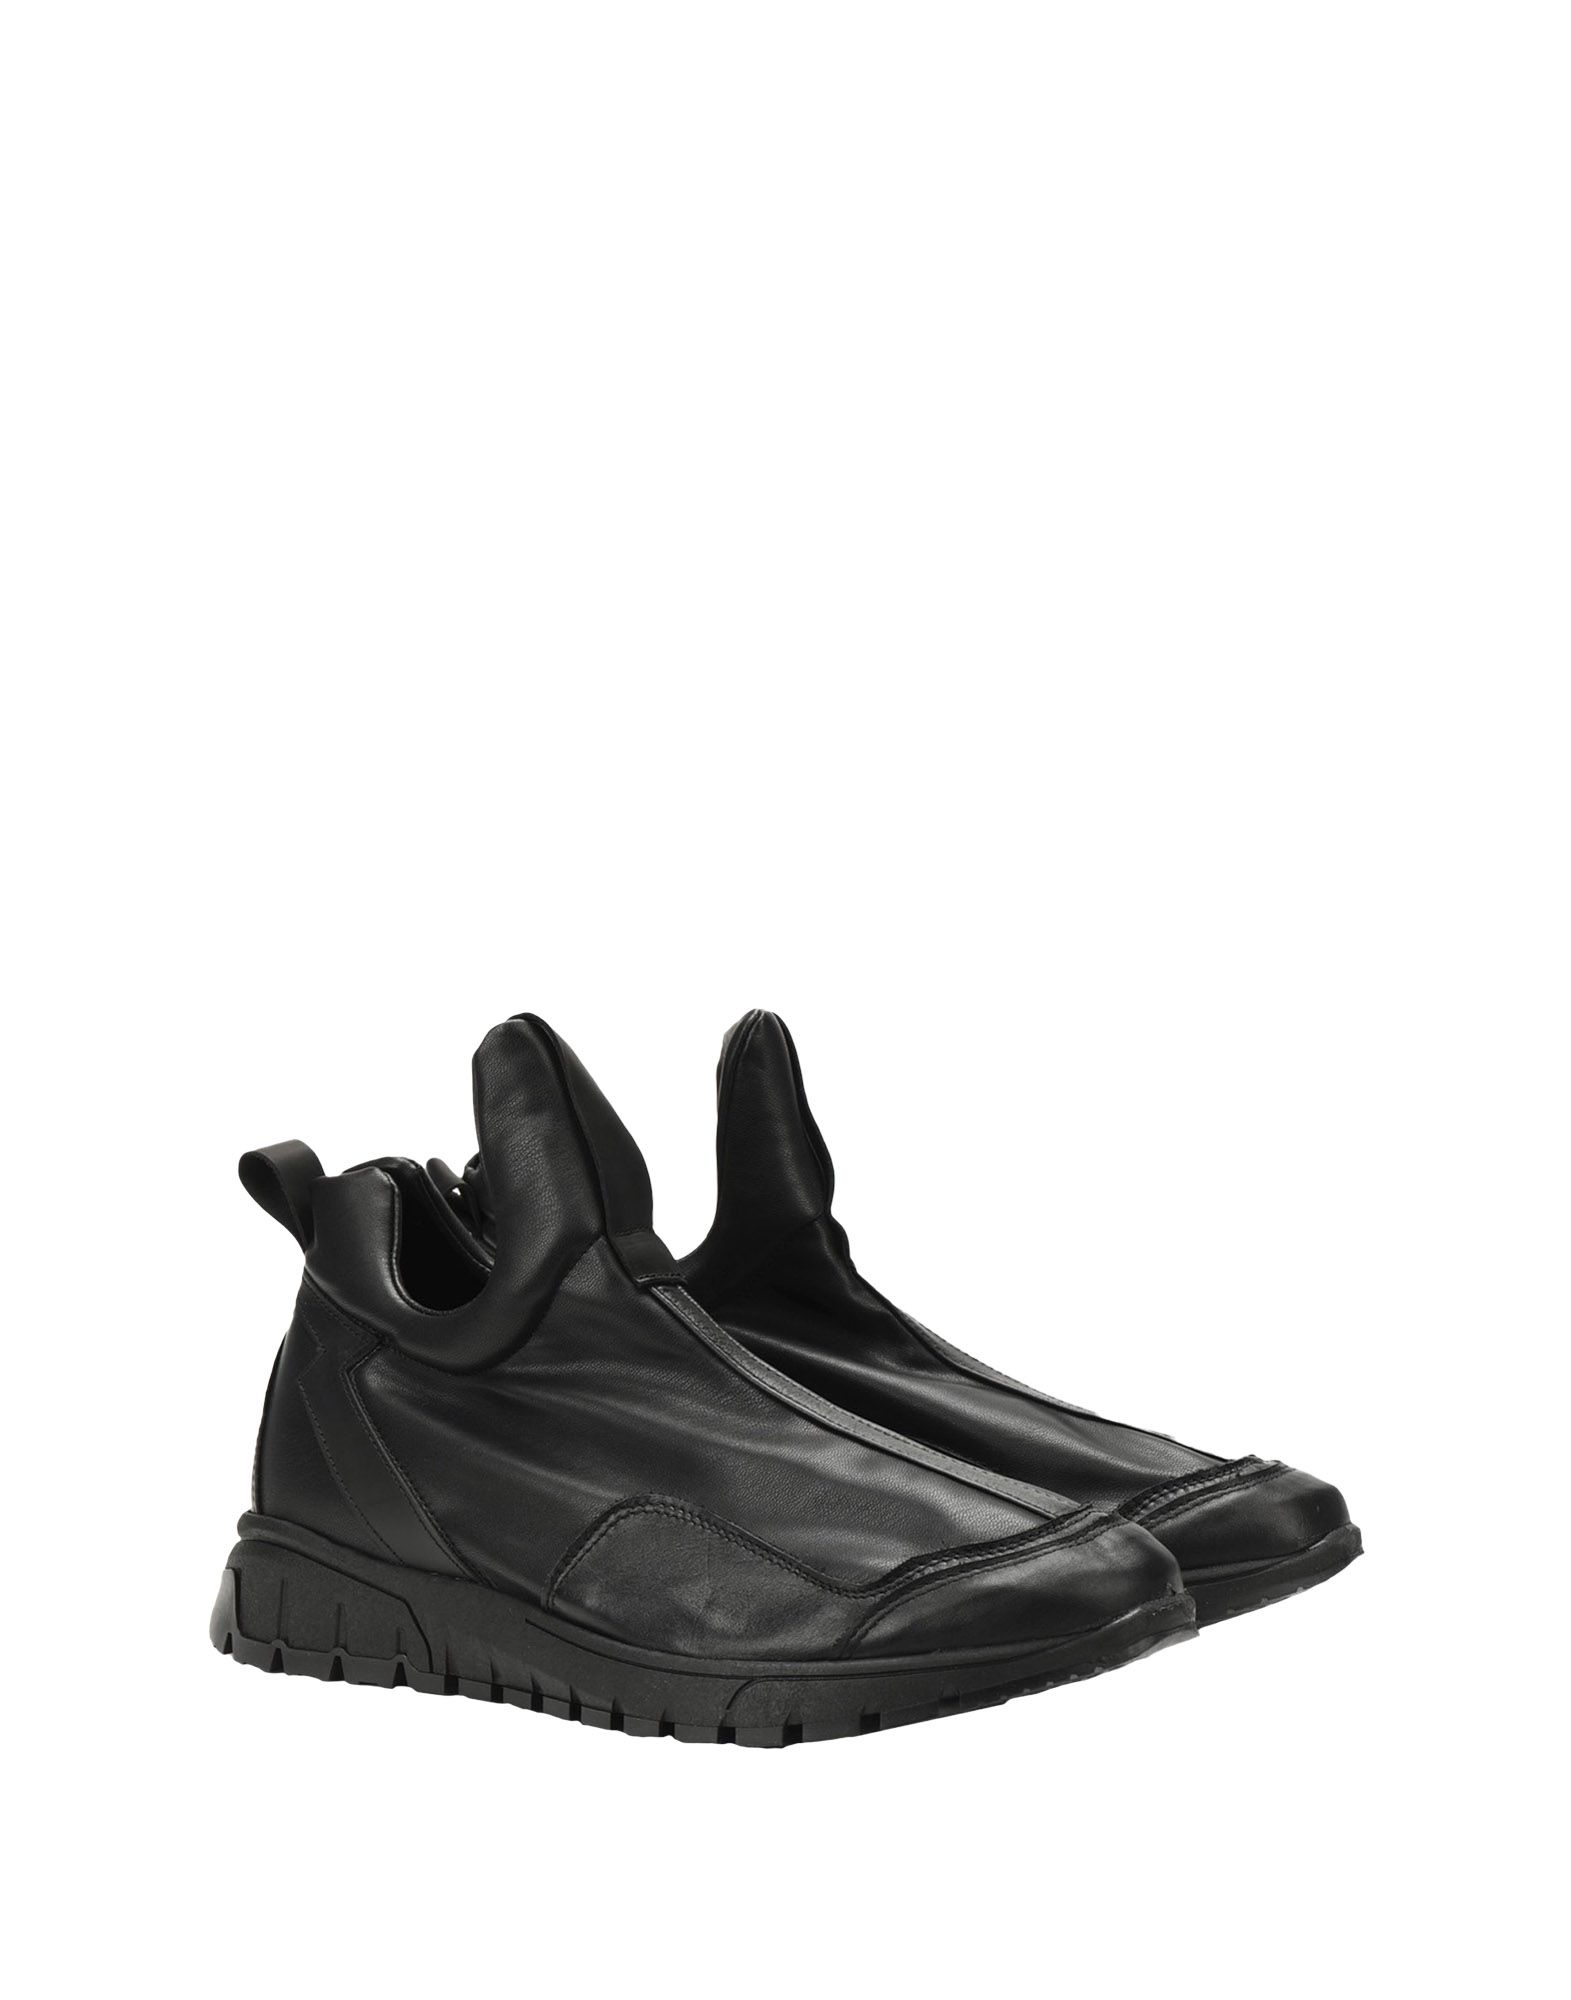 Savio Barbato Sneakers Herren  11540012TM Gute Qualität beliebte Schuhe